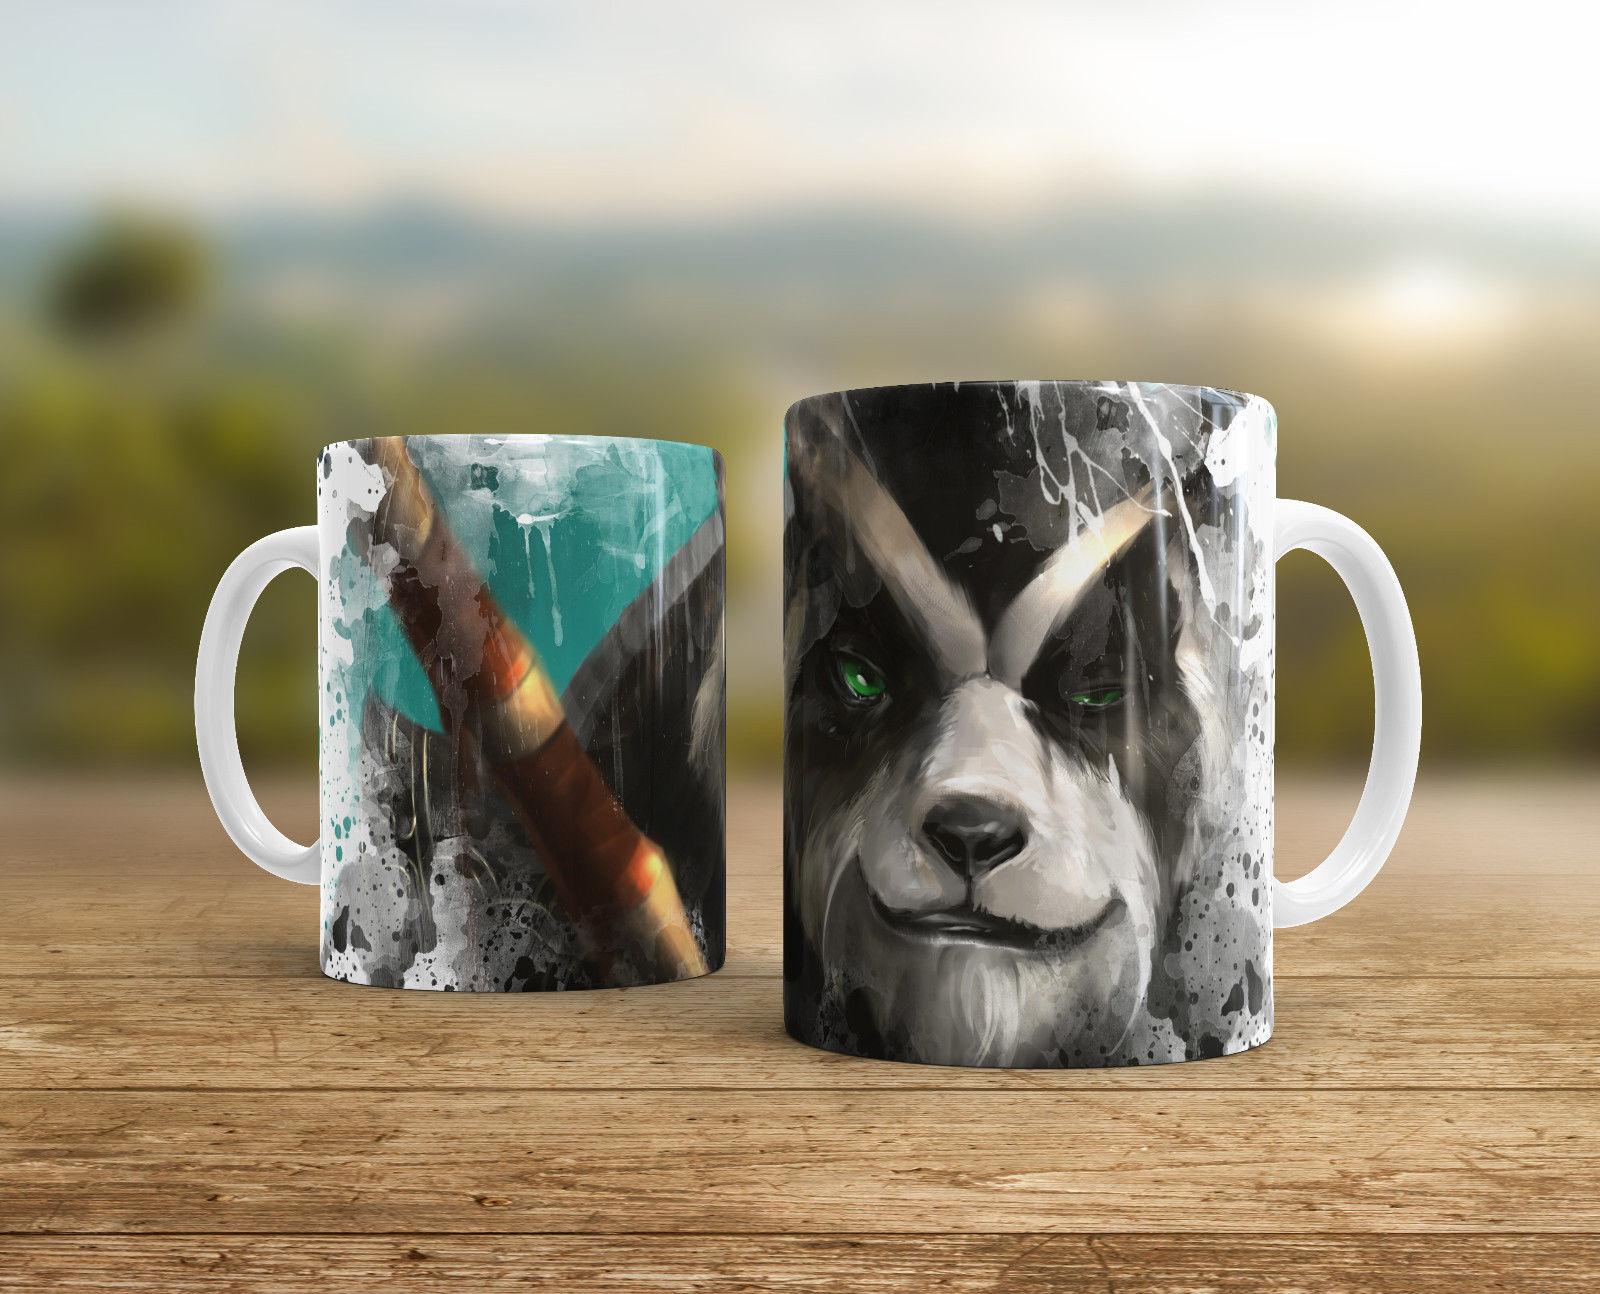 Mug Warcraft Wow Coffee Changing Magic Gamer World Of Color CtQrxsdh